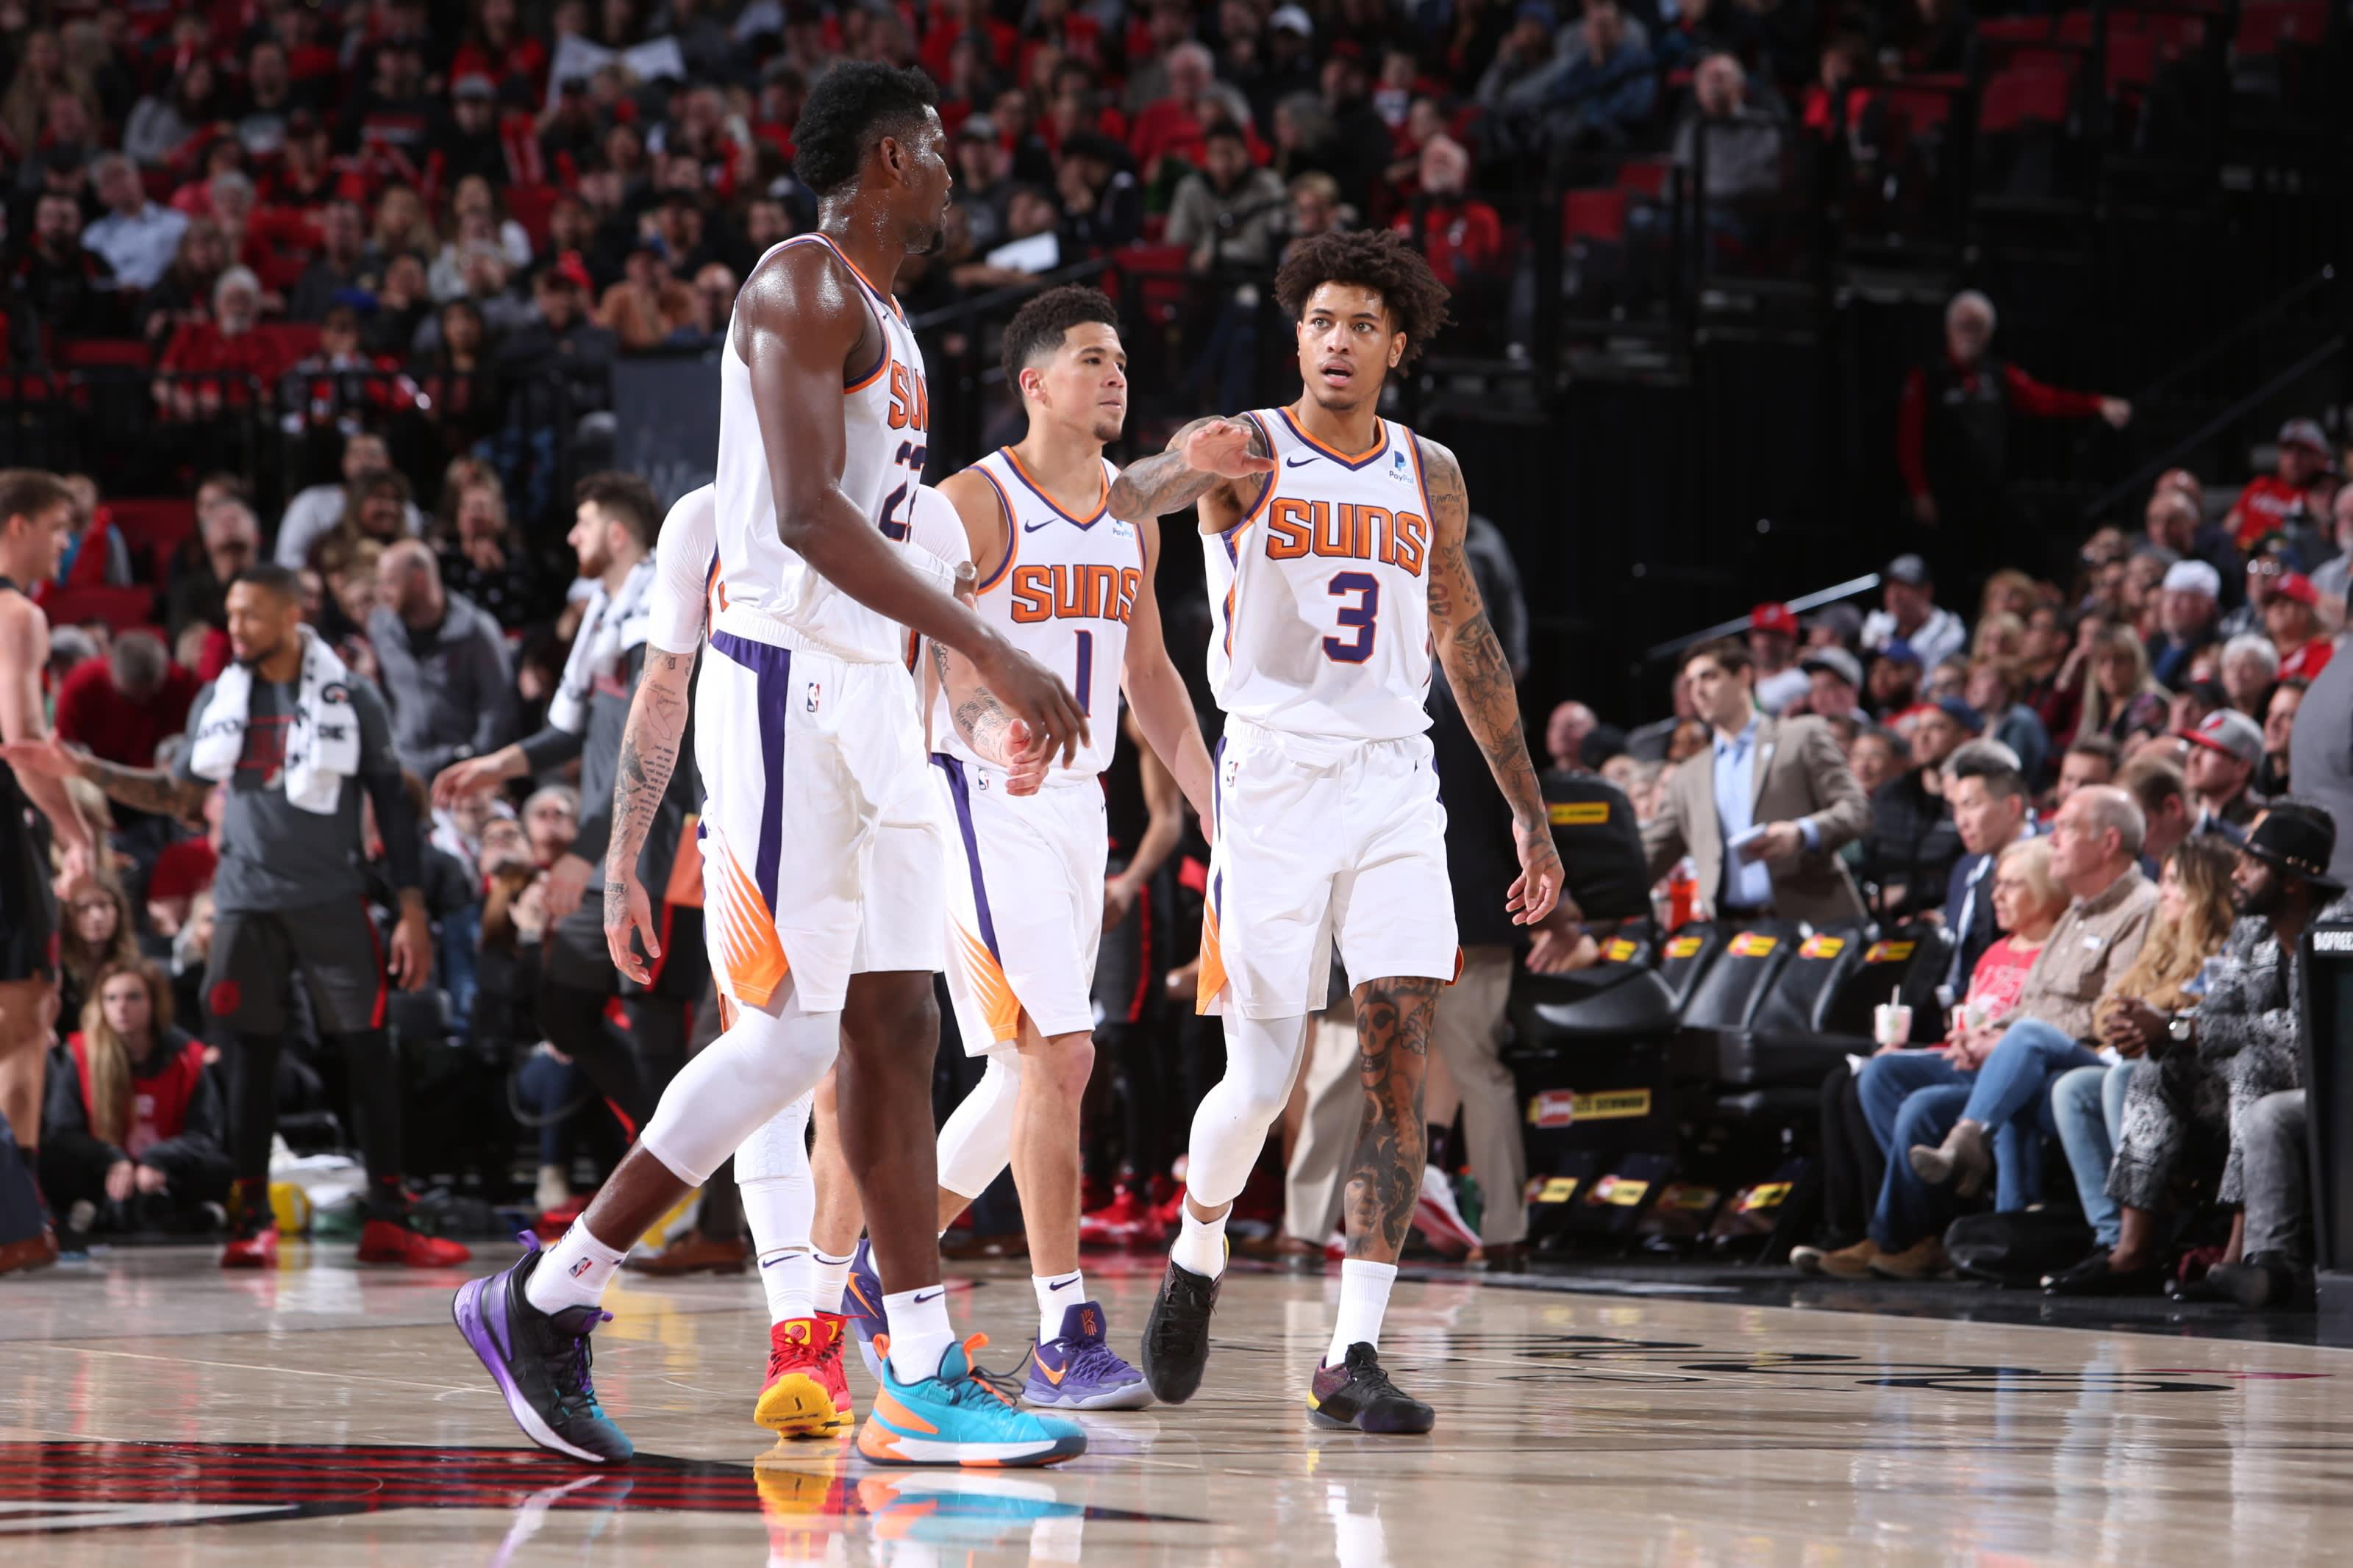 Best Case Fans 2021 Phoenix Suns: Imagining the best case scenario for next season